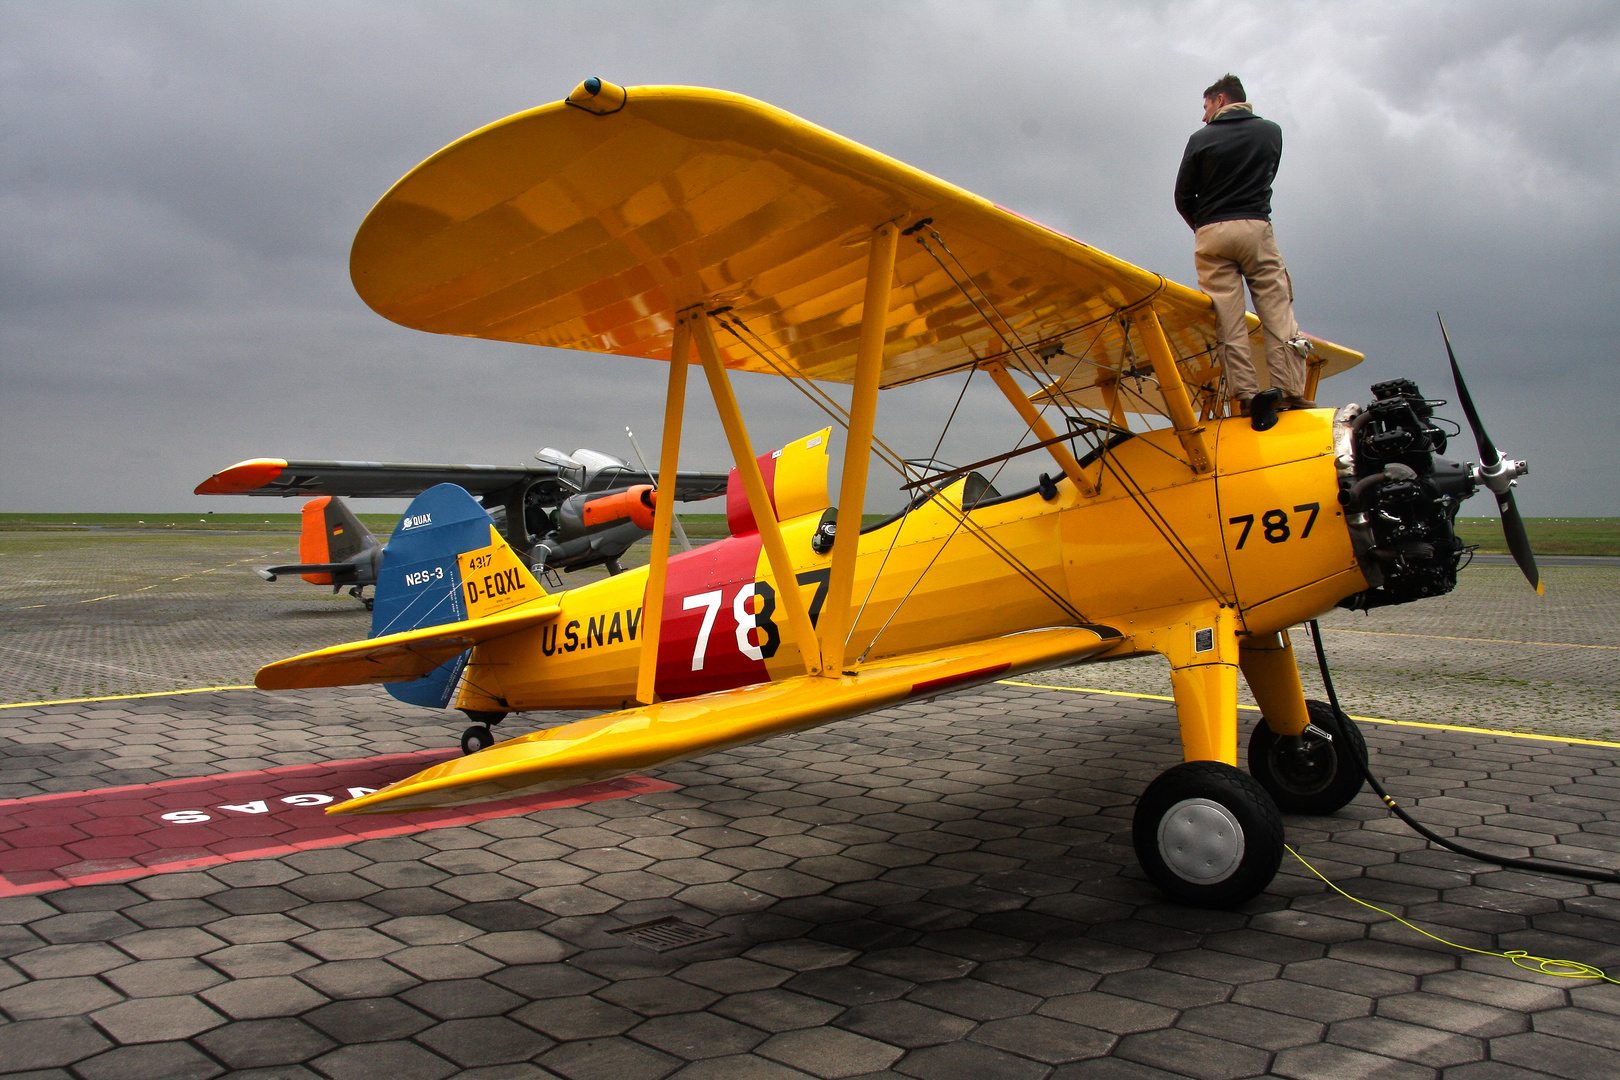 Stearman & Do27 beim Tankstop auf dem Weg zum F4 Flyout nach Wittmund